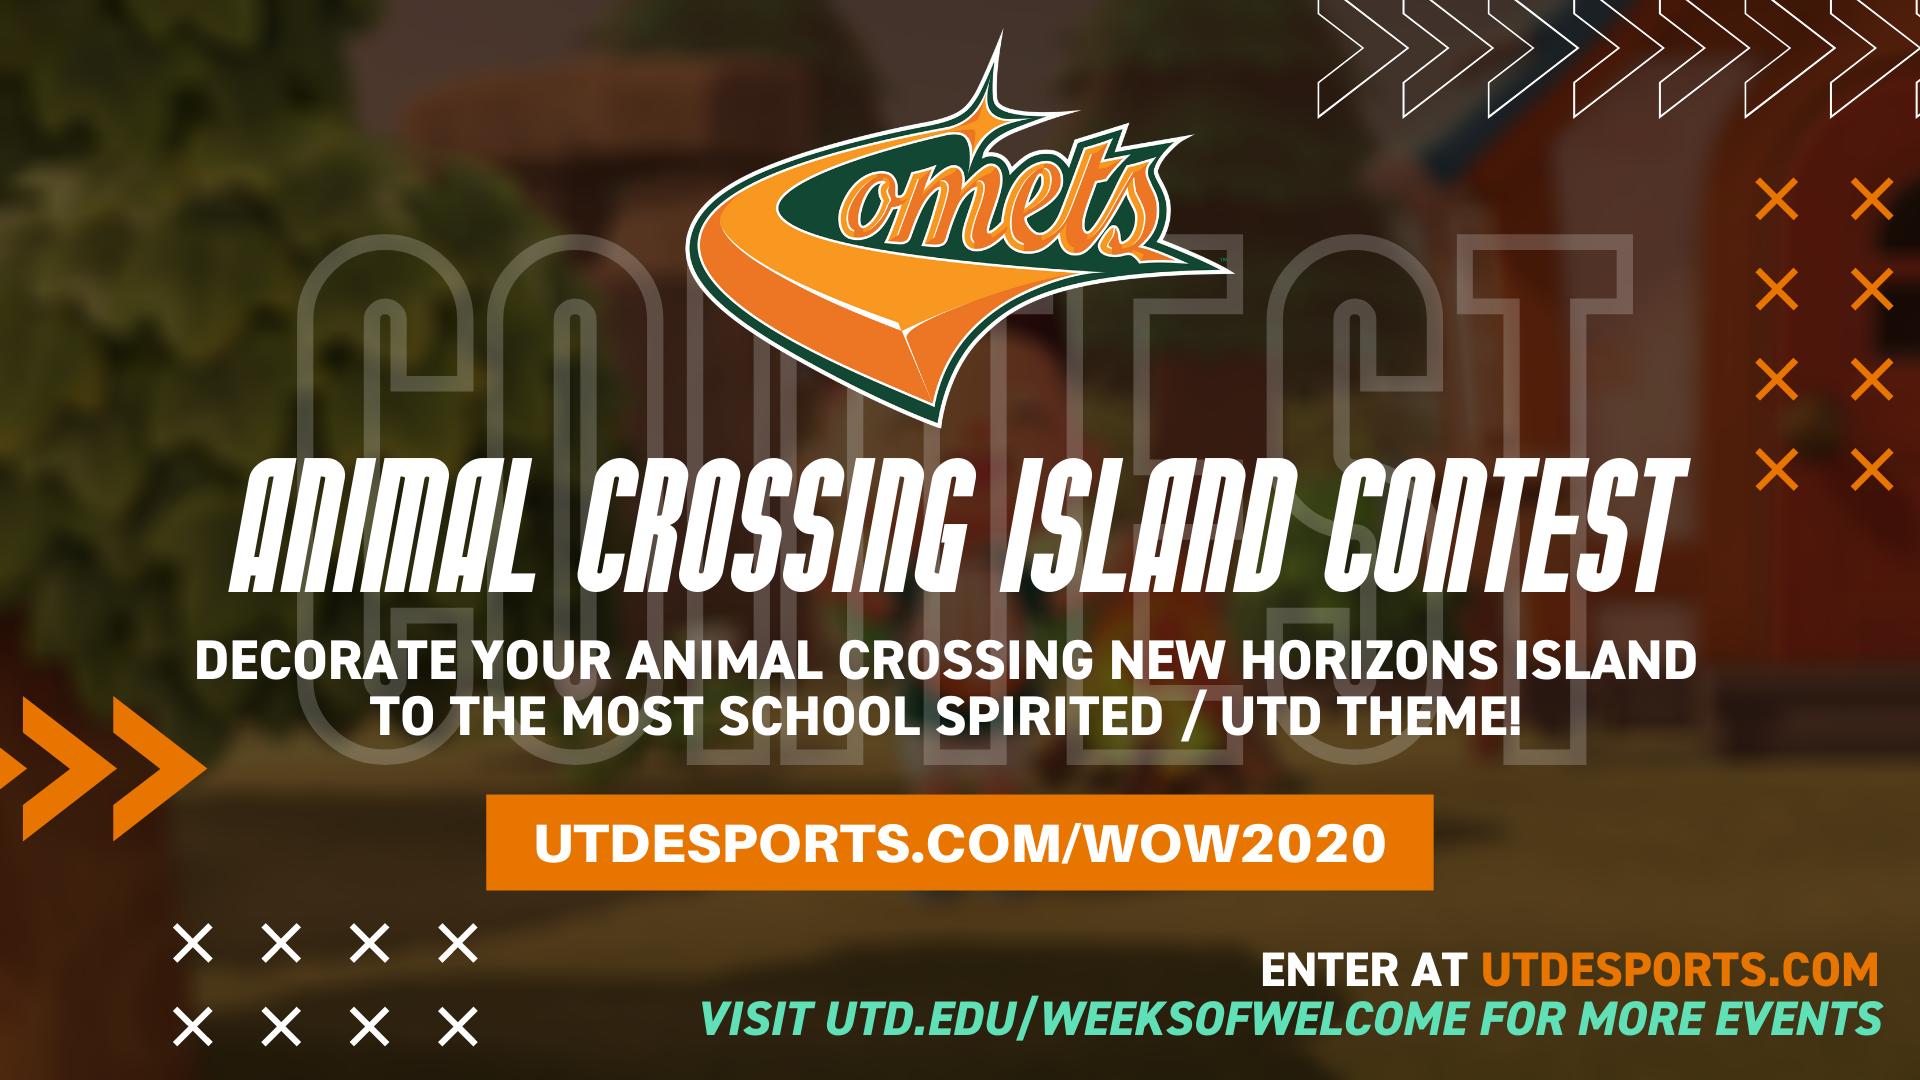 UTD Animal Crossing Island Theme Contest – Fall 2020